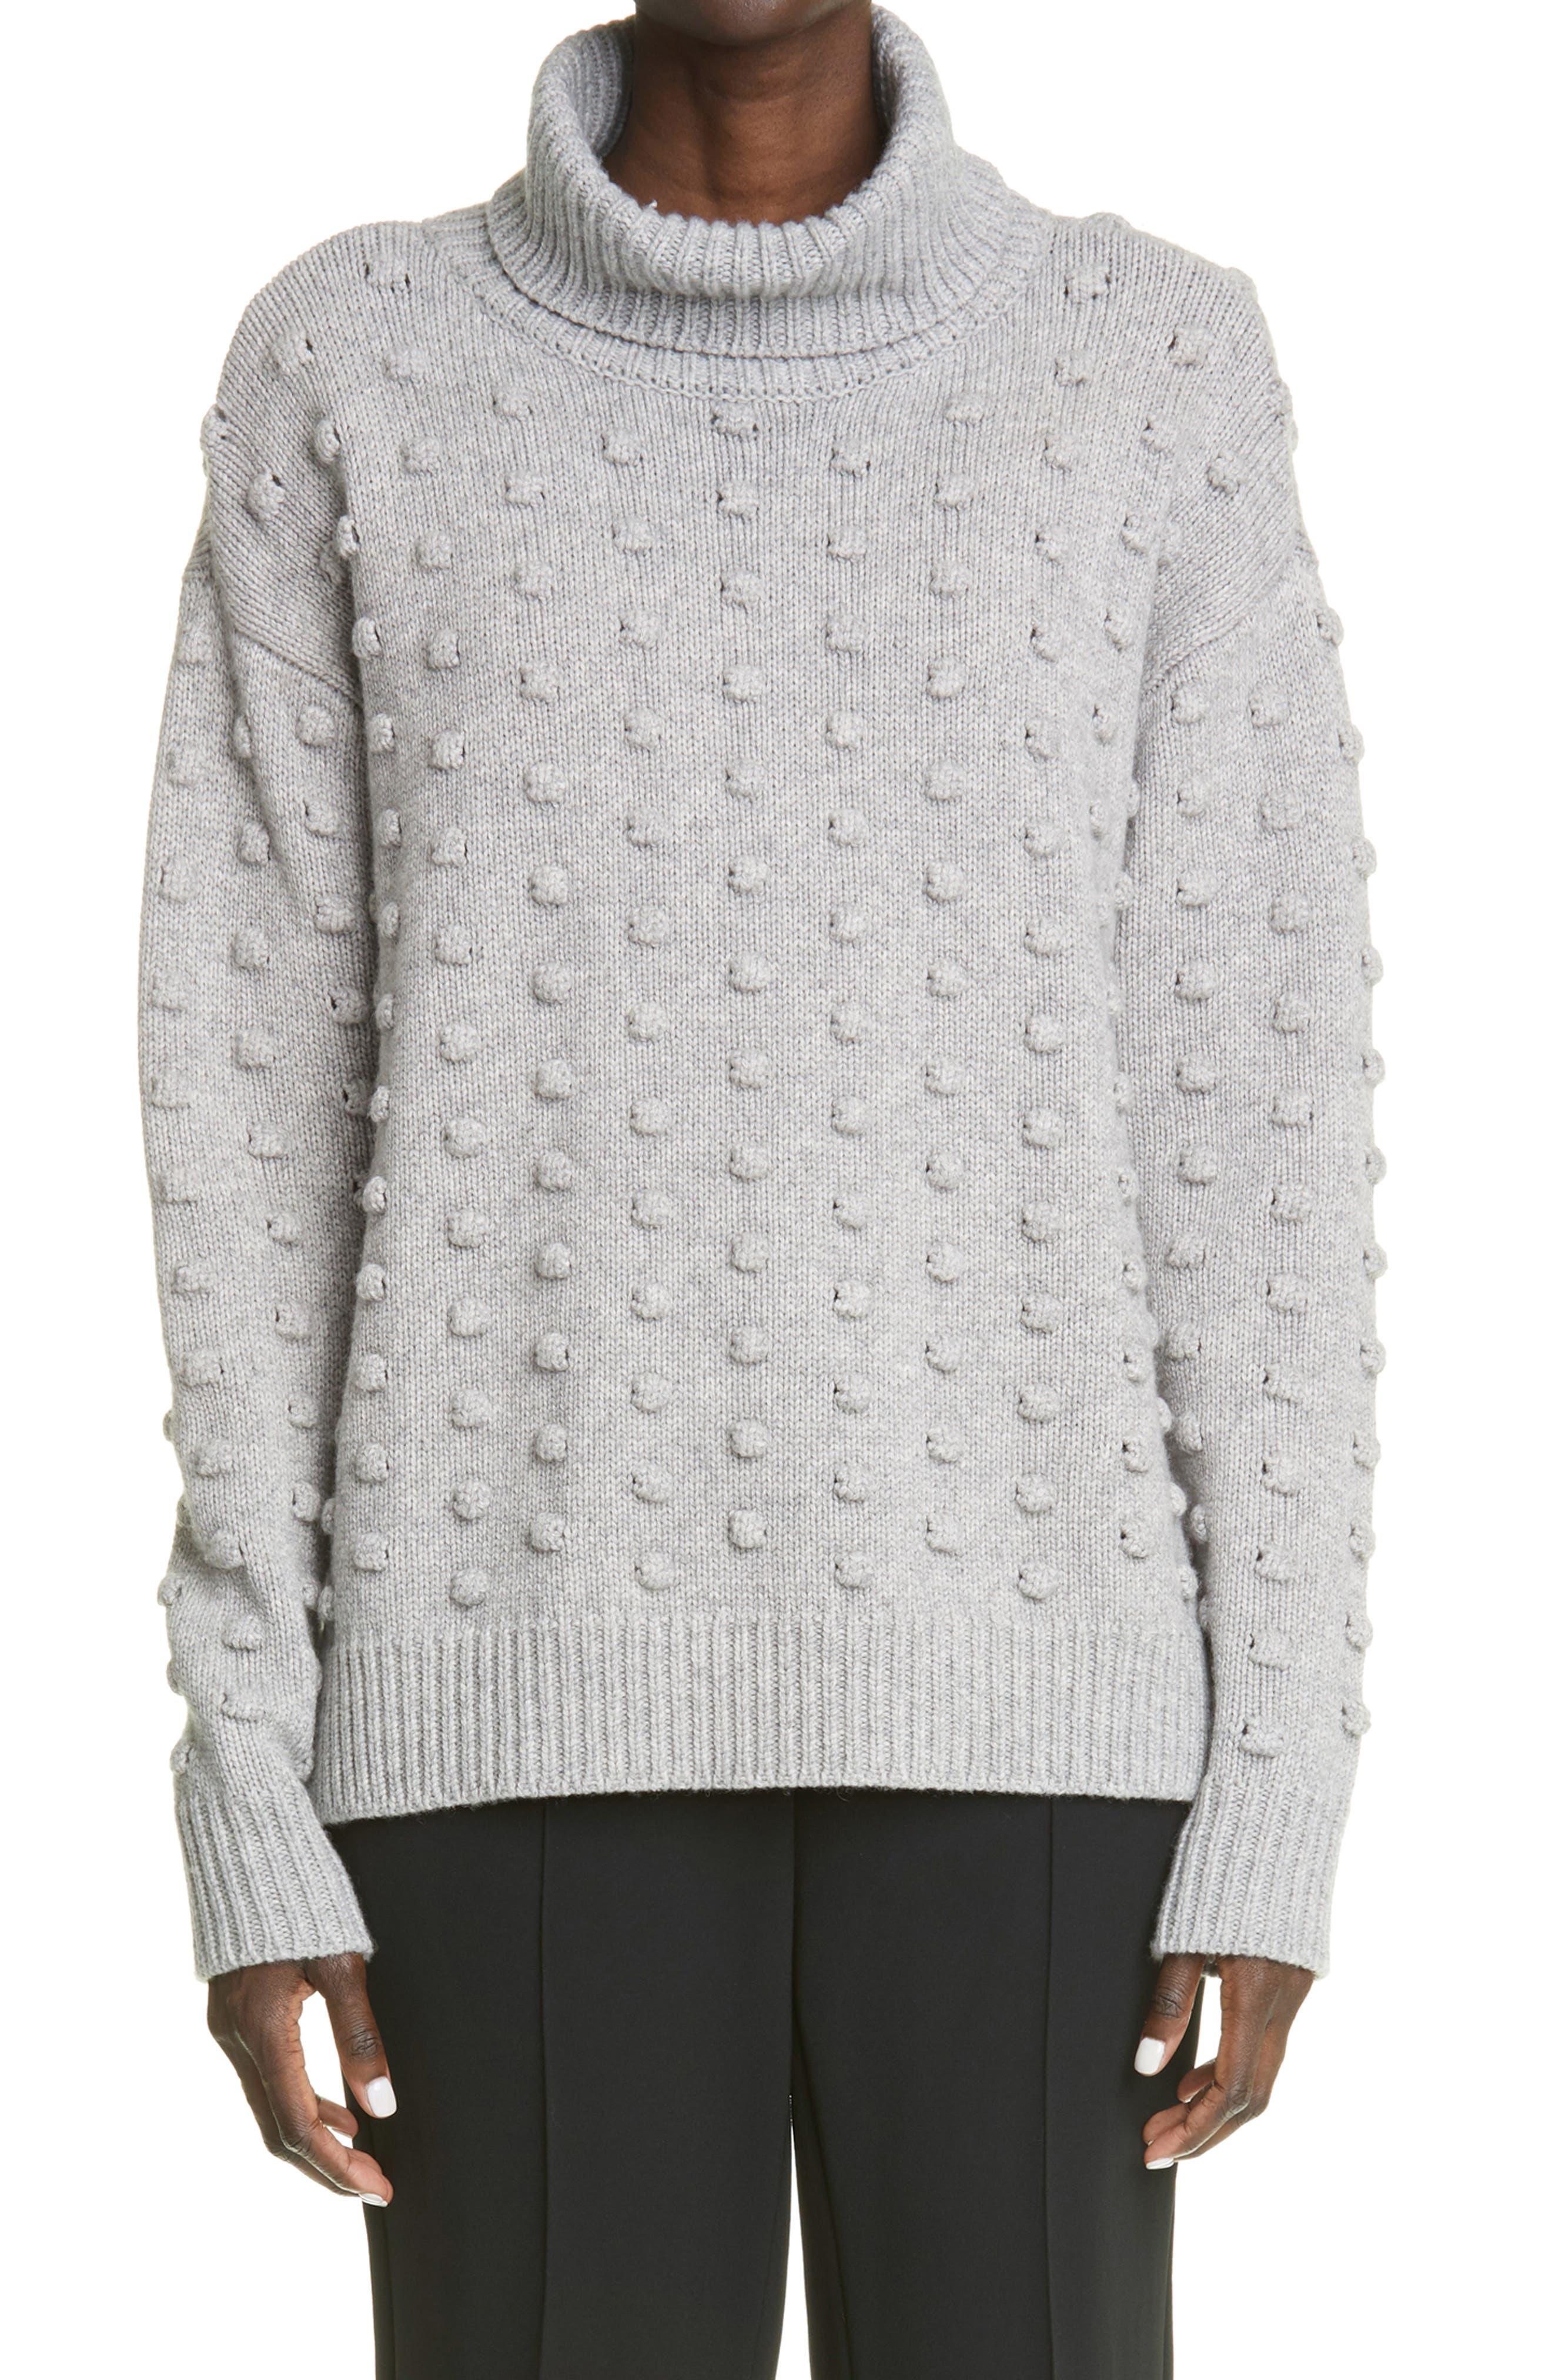 Popcorn Stitch Oversize Wool & Cashmere Sweater